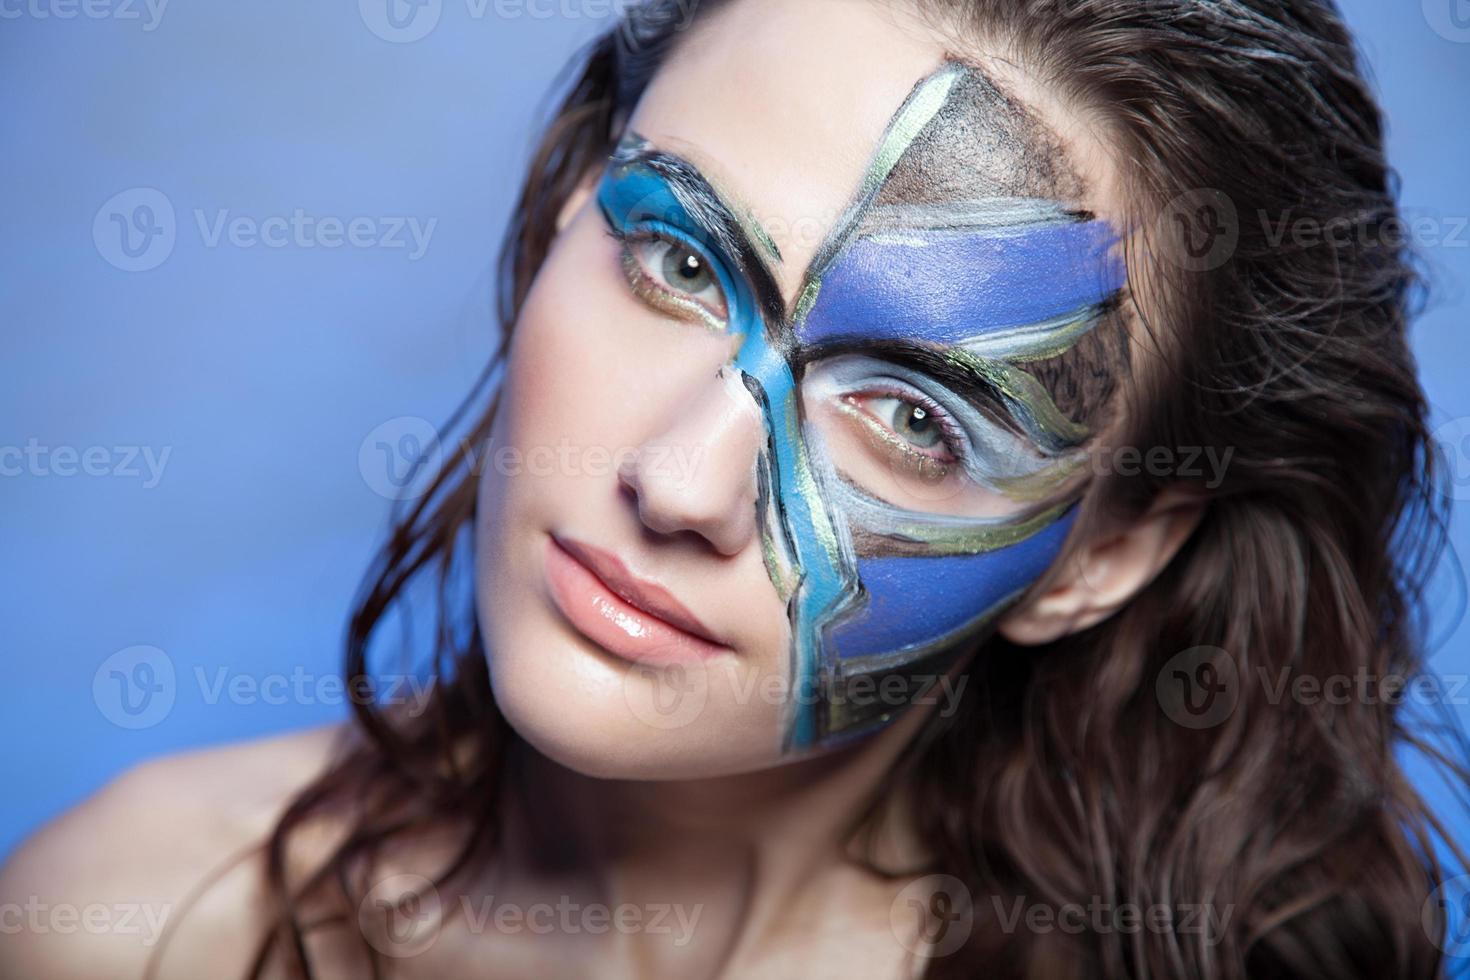 mooie mode vrouw kleur gezicht kunst portret op blauwe achtergrond foto